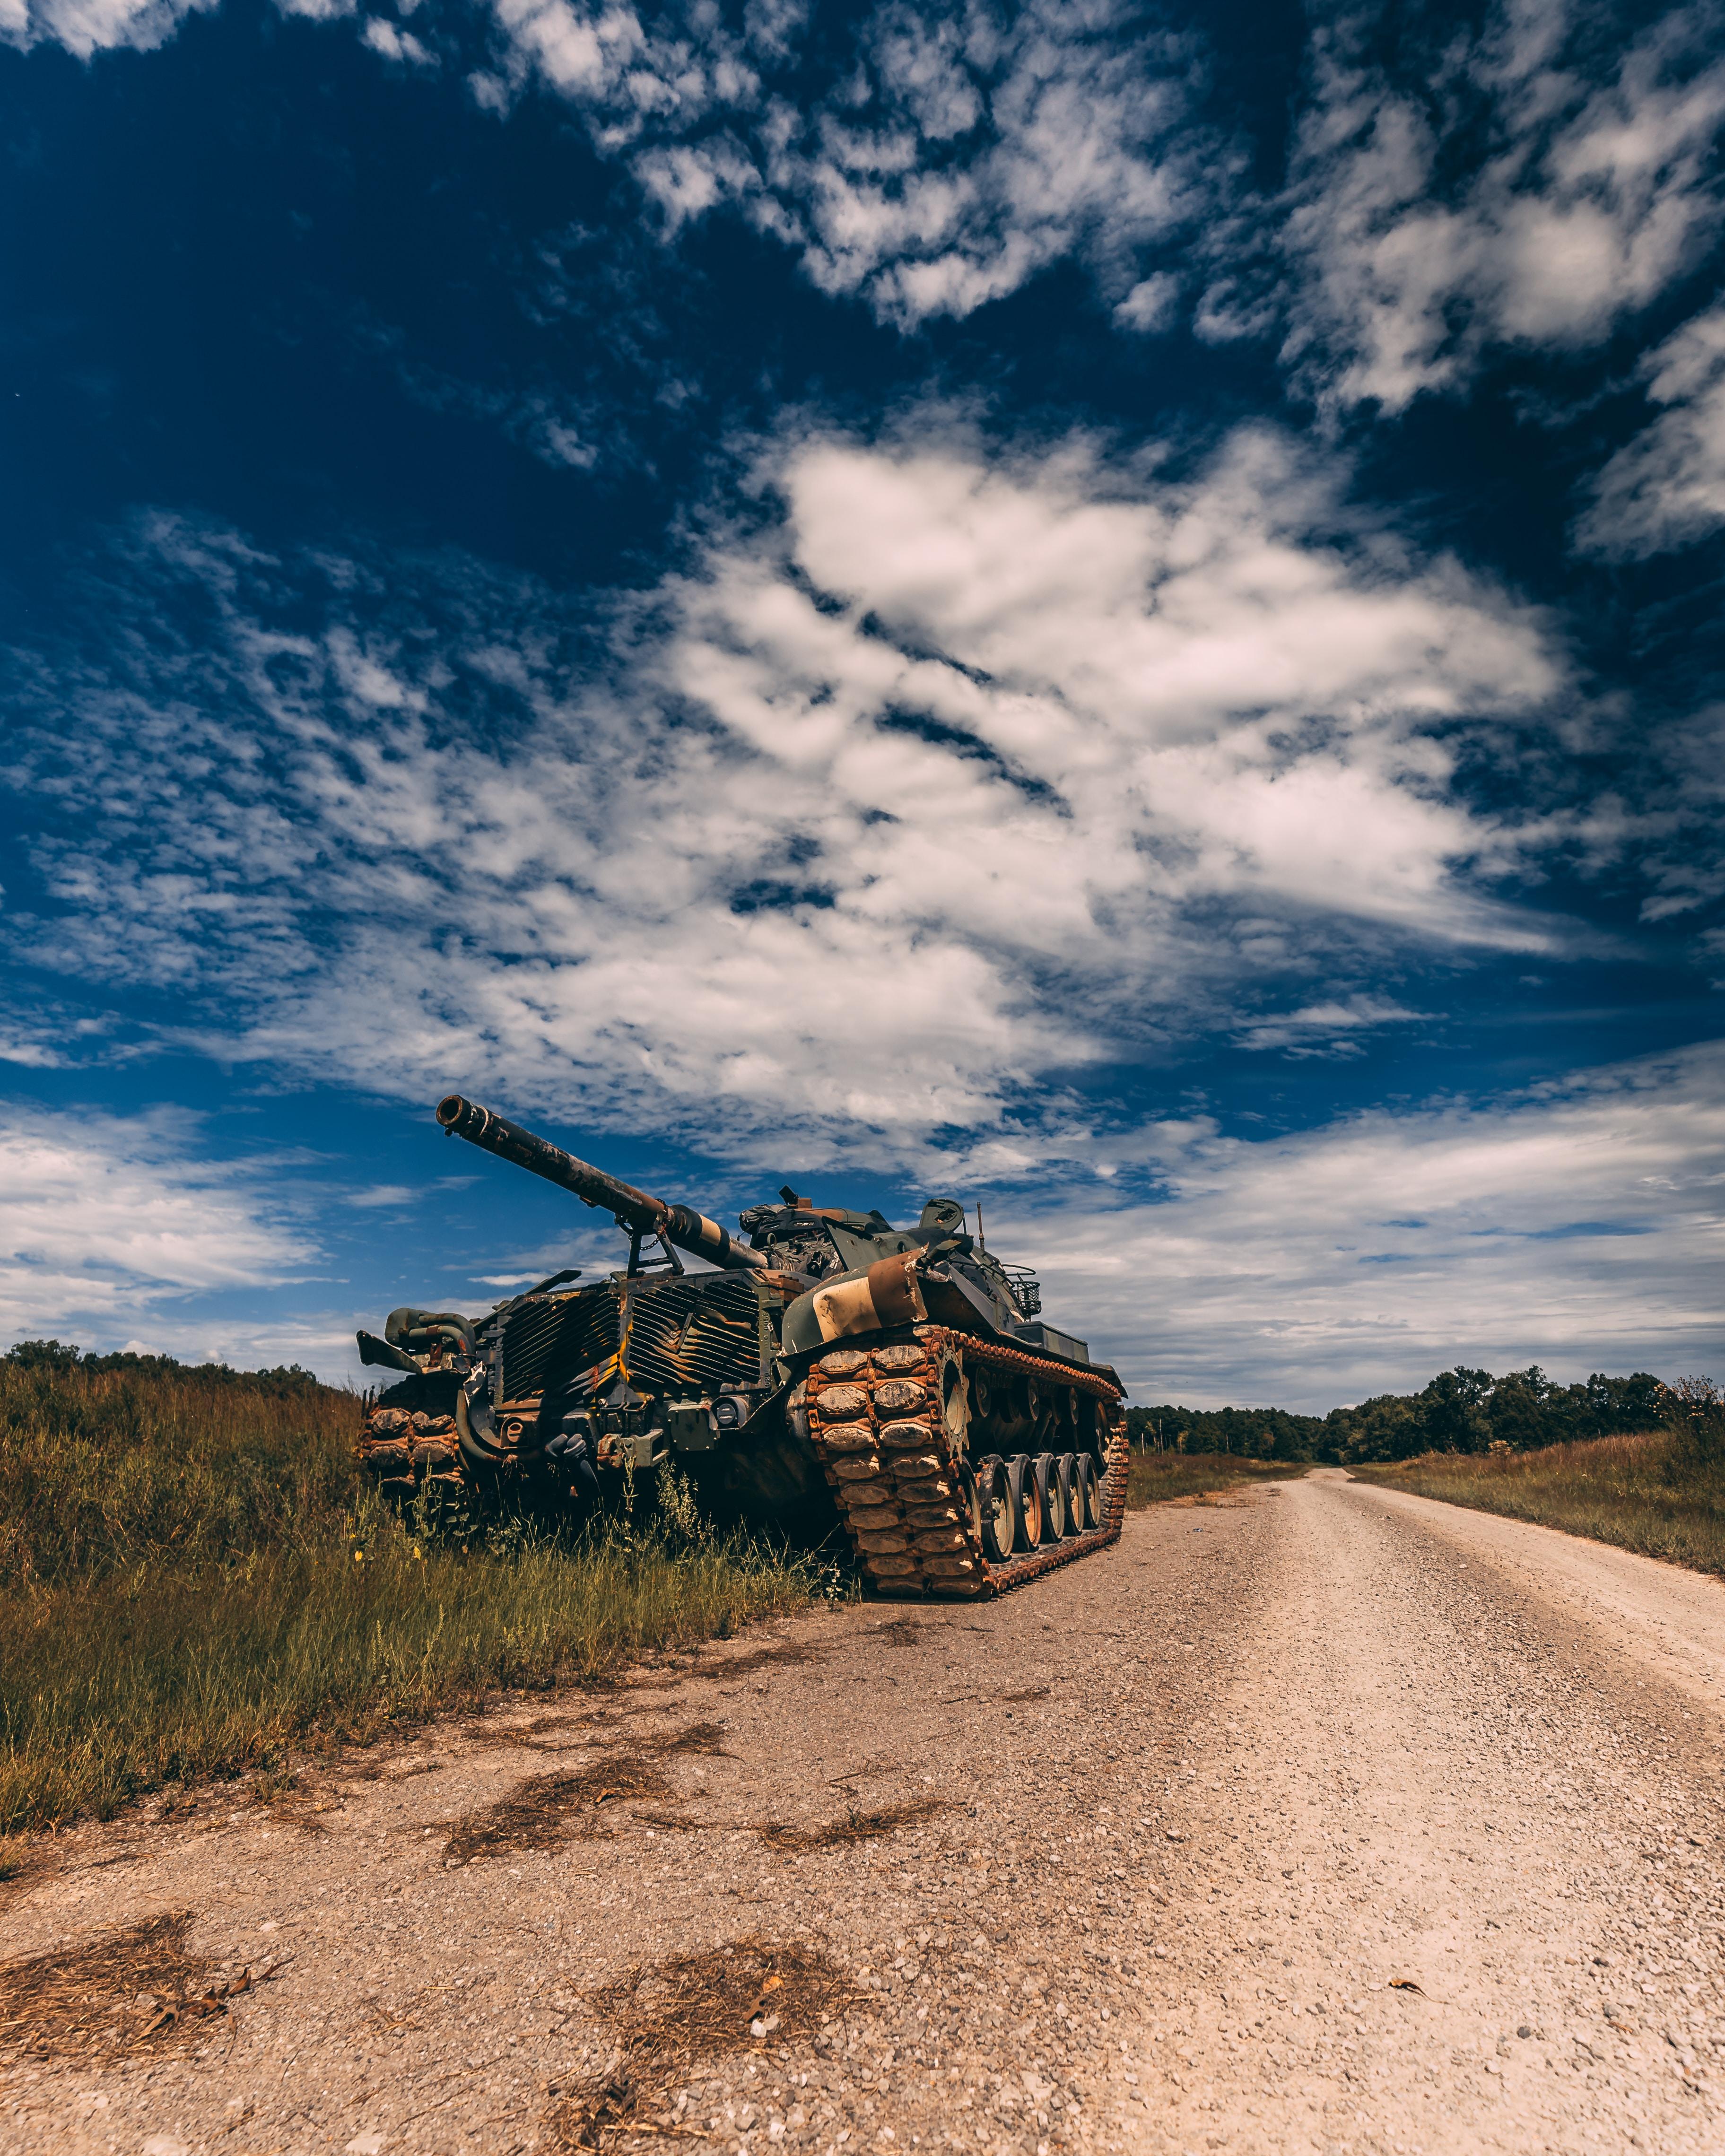 grey battle tank on road during daytime